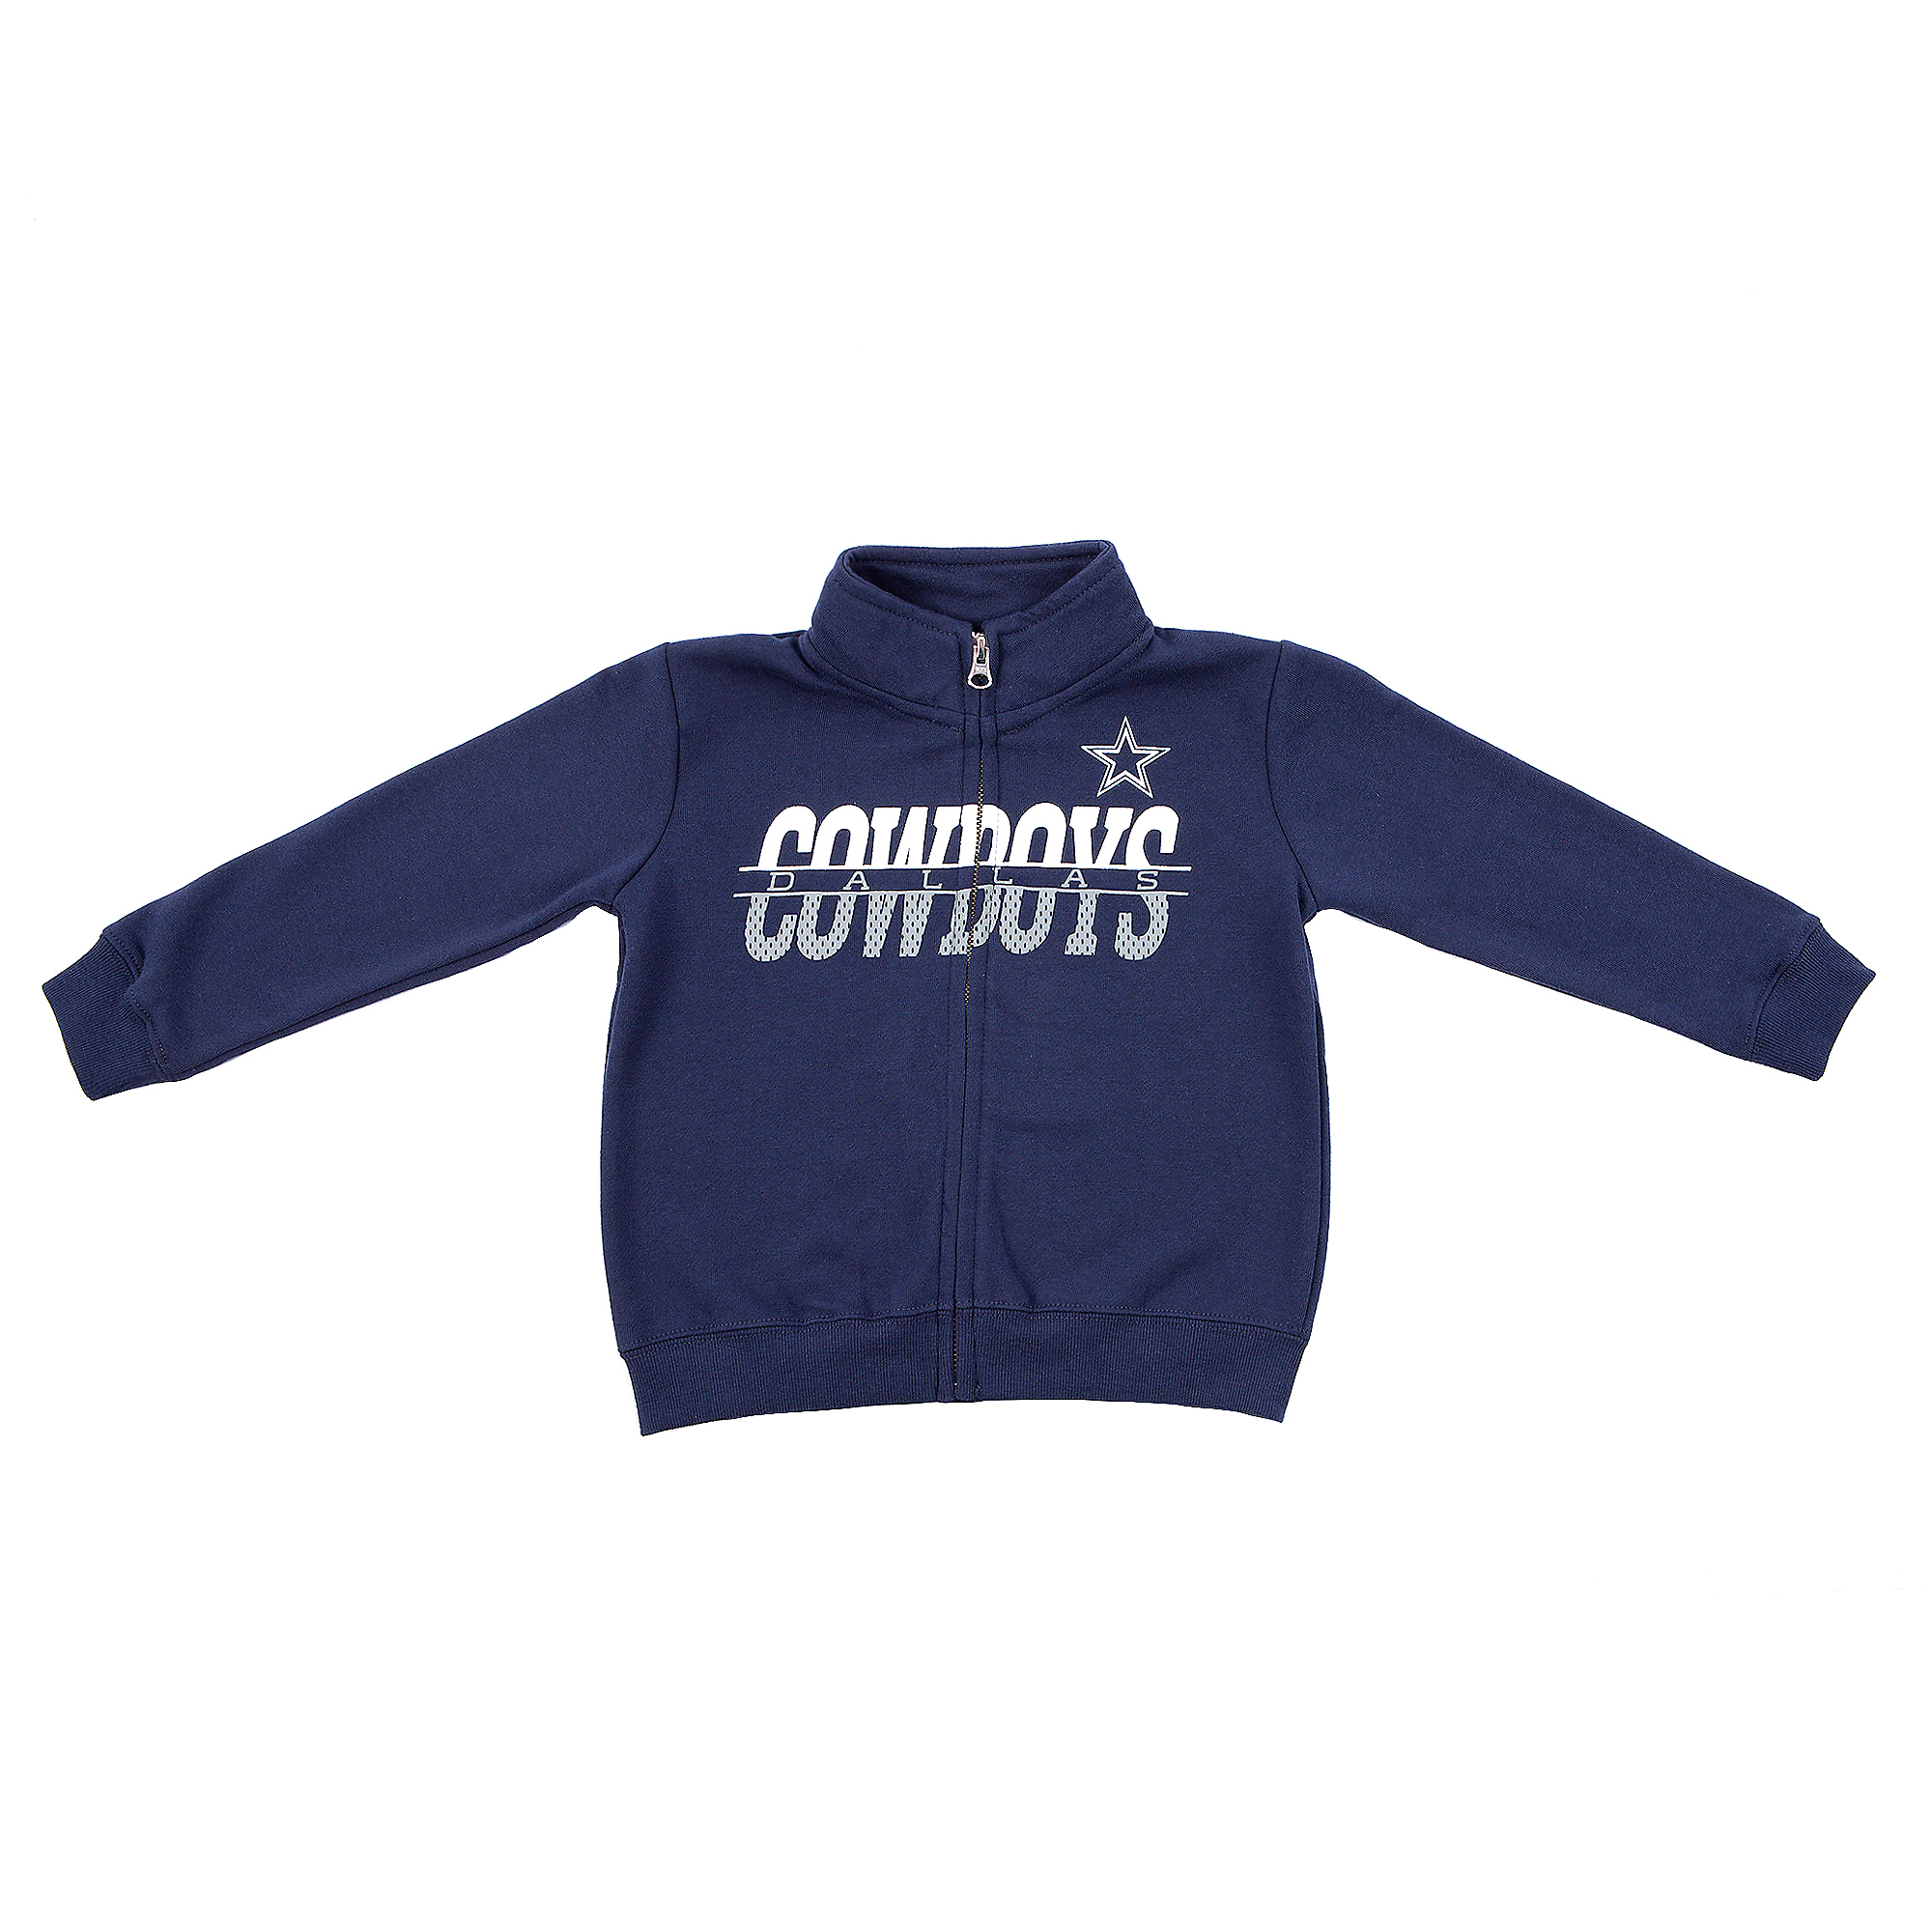 Dallas Cowboys Toddler Gunner Full Zip Jacket